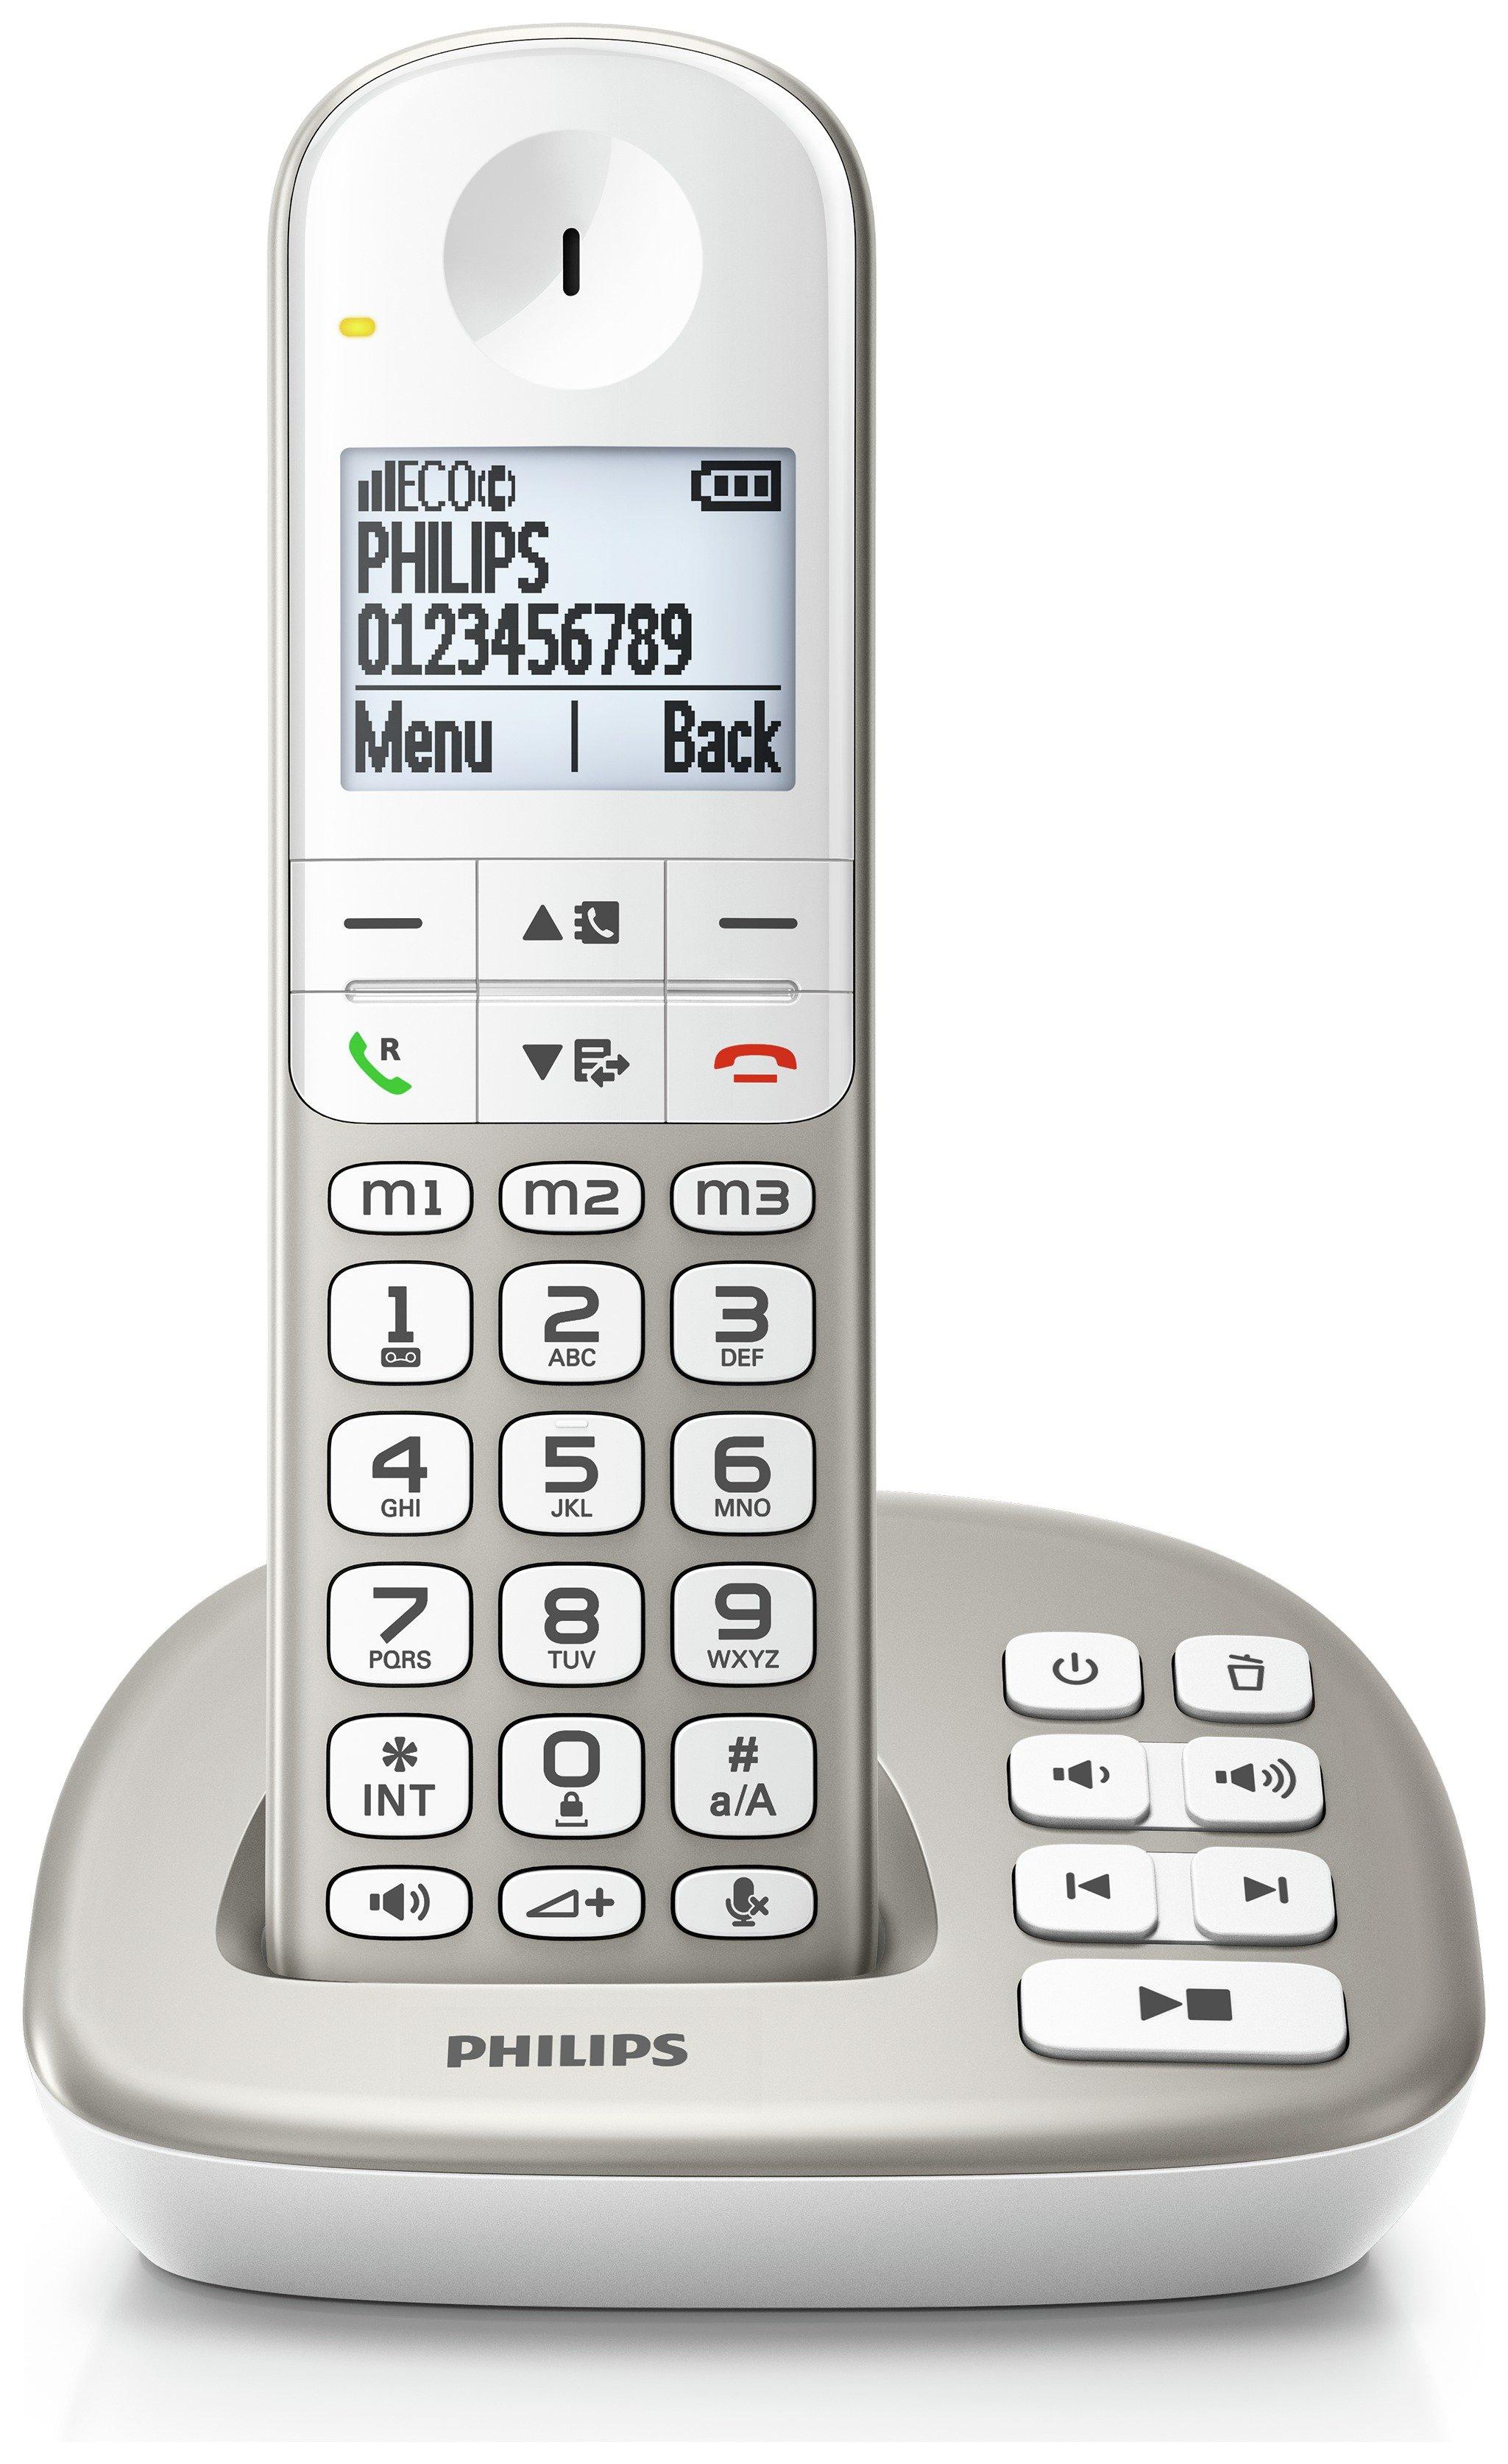 Philips - XL4951S 05 Single - Cordless Telephone